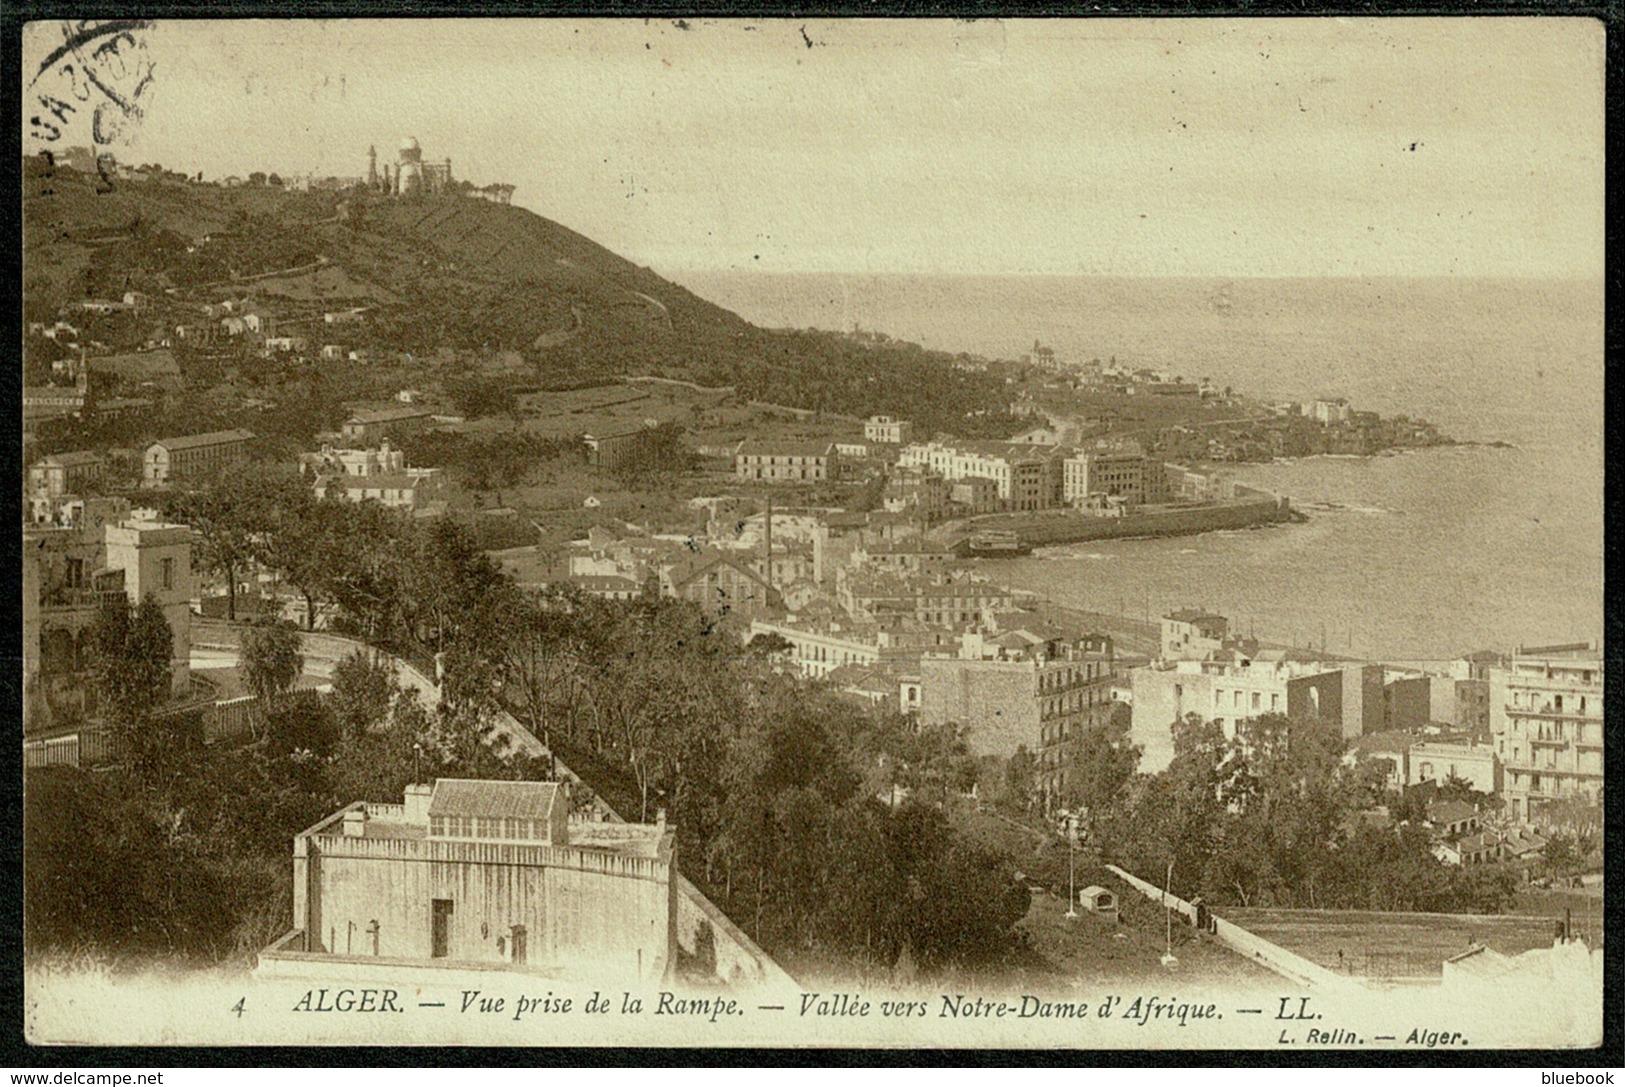 Ref 1261 - 1906 Algeria LL Postcard - Alger Plateau Sauliere Postmark France Stamp 10c Rate To London - Algiers